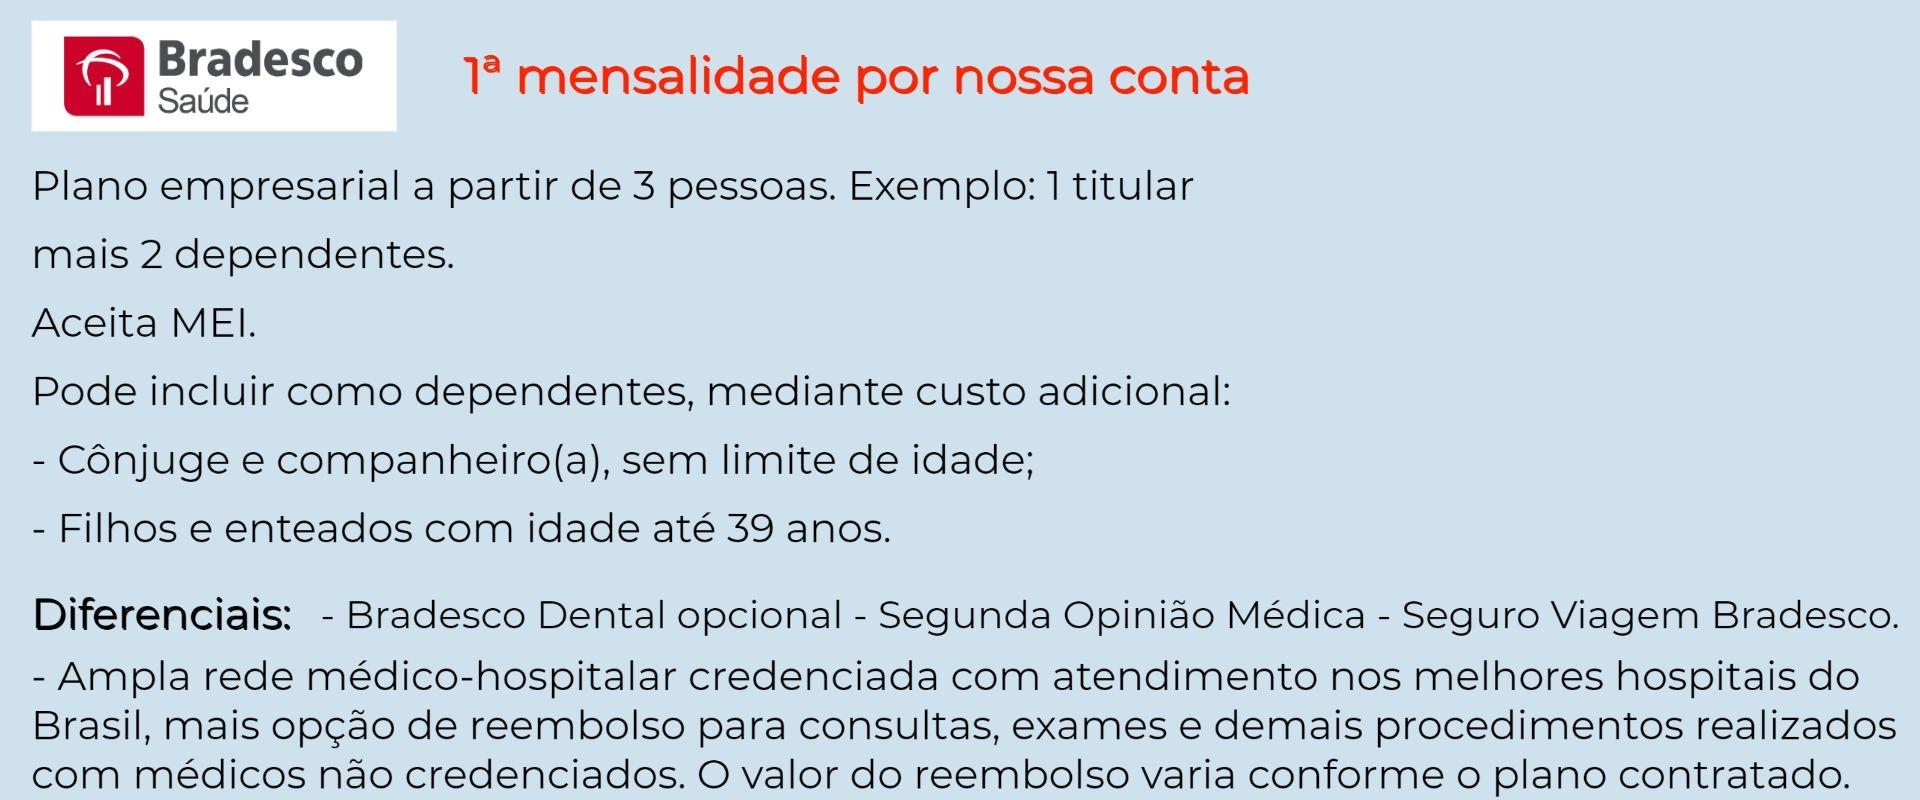 Bradesco Saúde Empresarial - Águas Claras